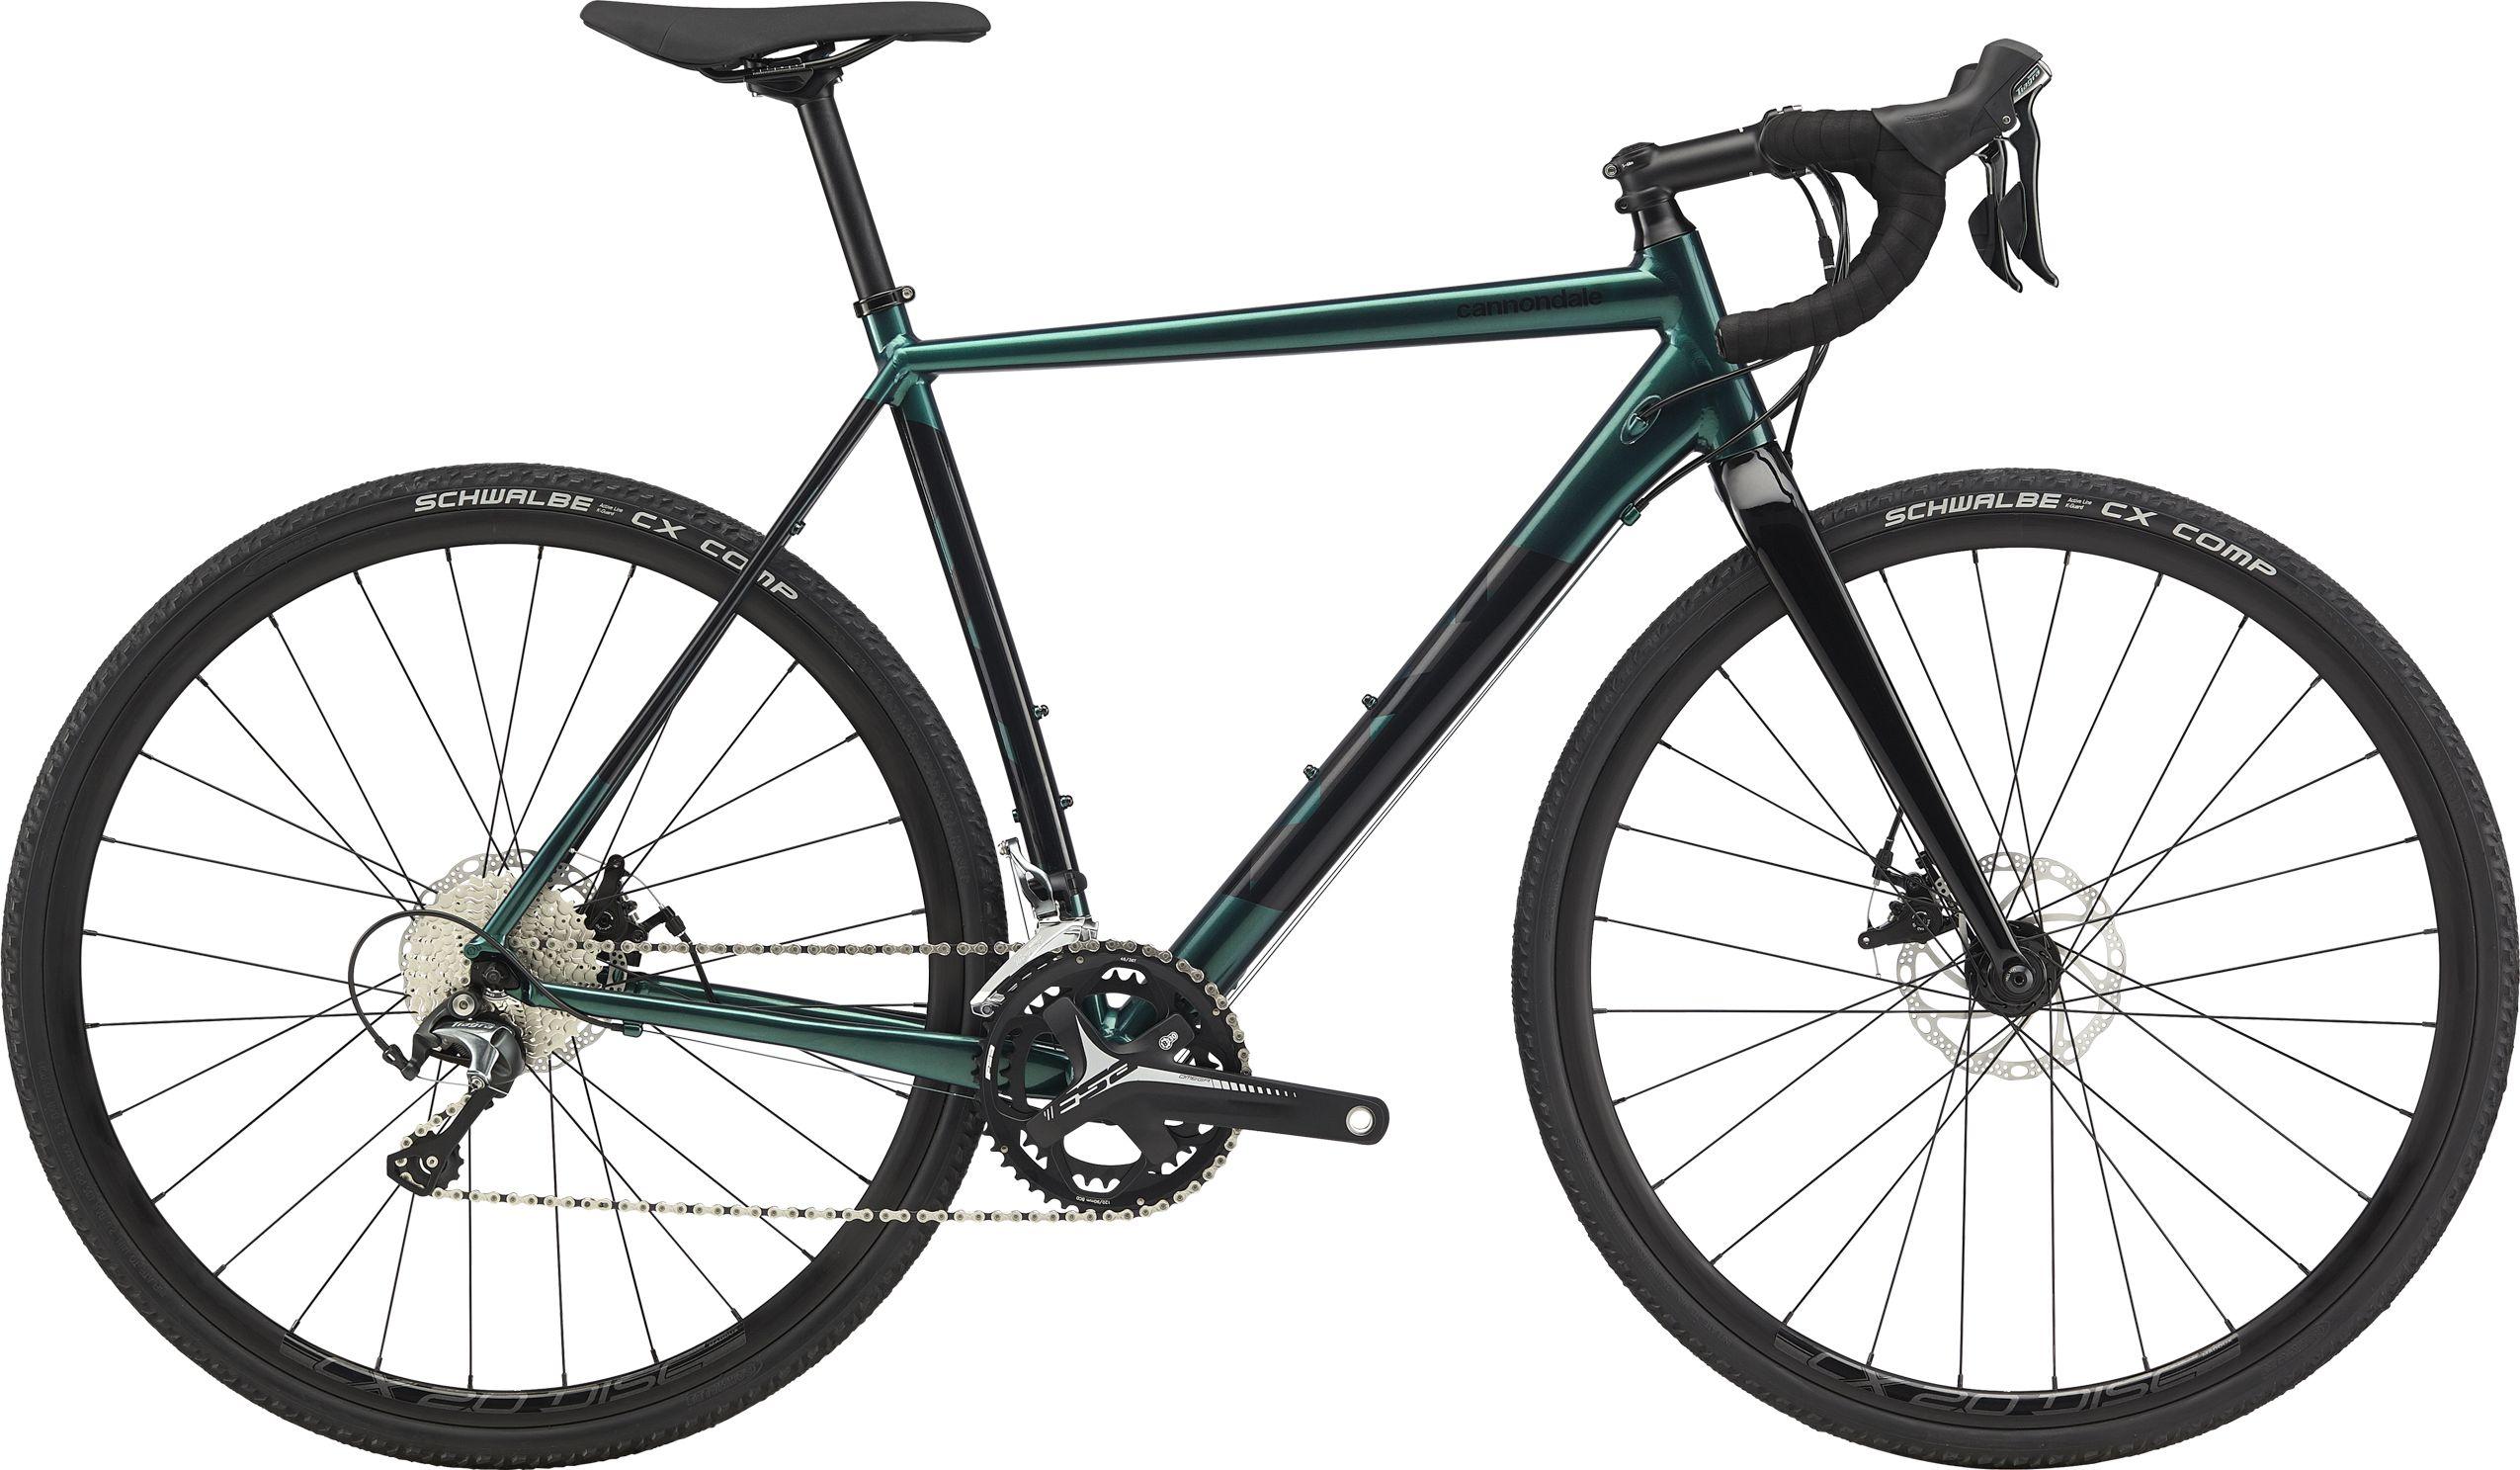 Cannondale Caadx Tiagra Cyclocross Bike 2020 | Cross-cykler